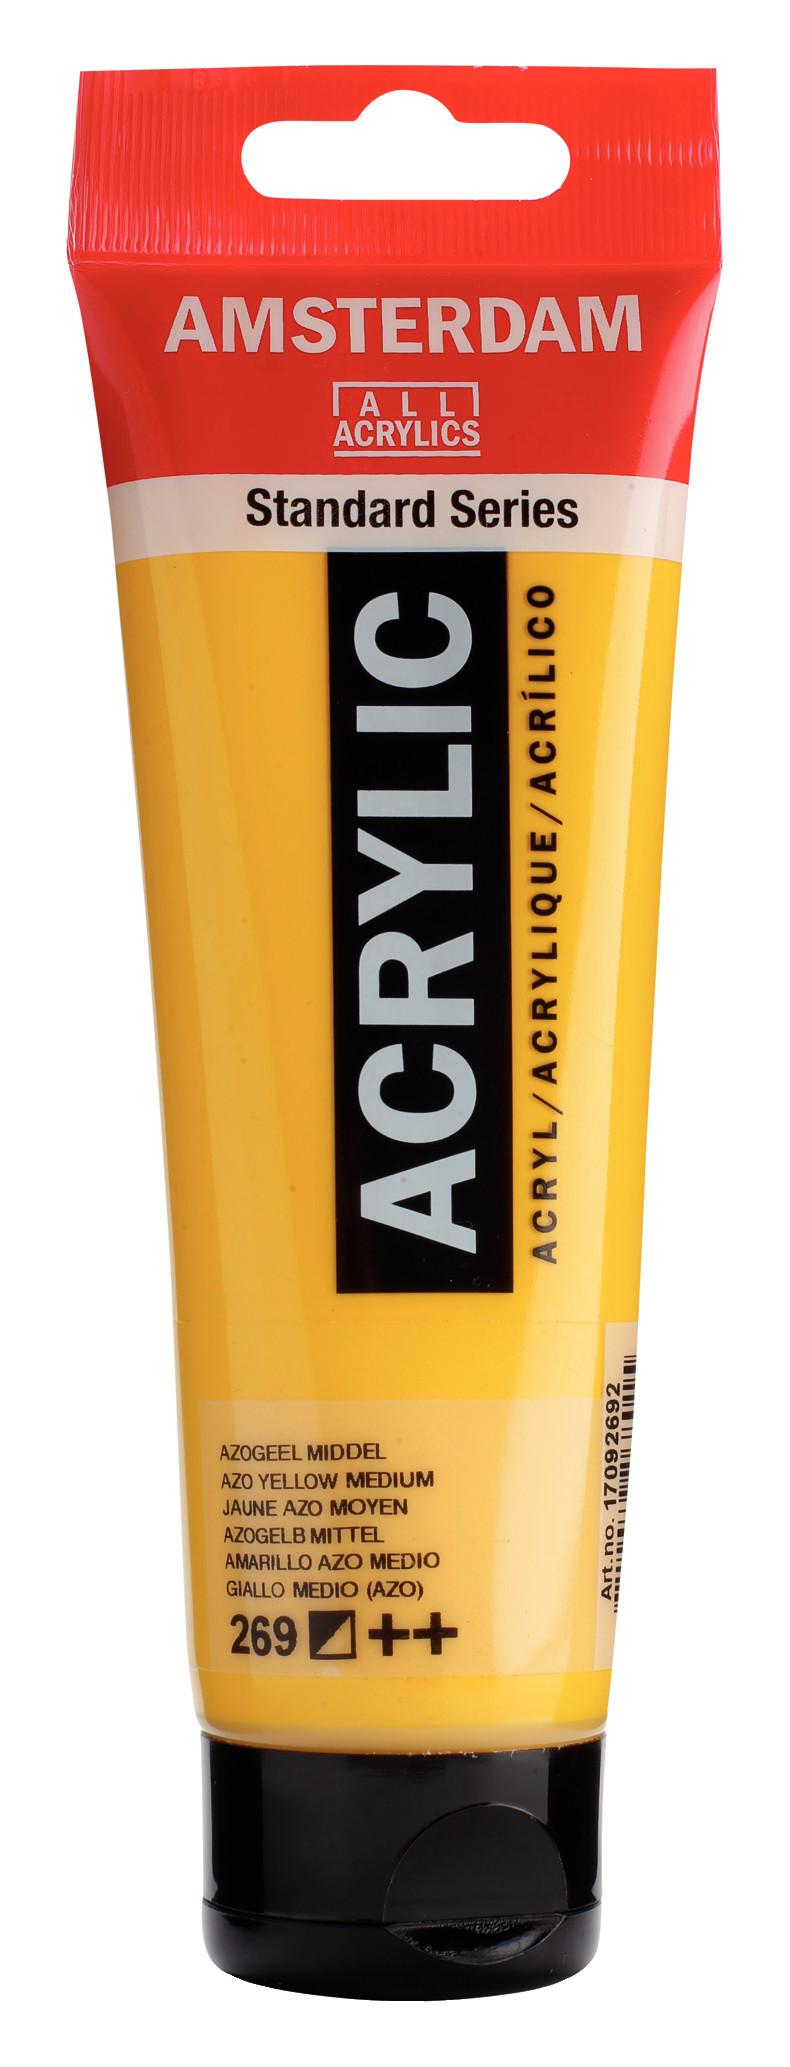 Amsterdam Standard Series Acrylic Tube 120 ml Azo yellow medium 269